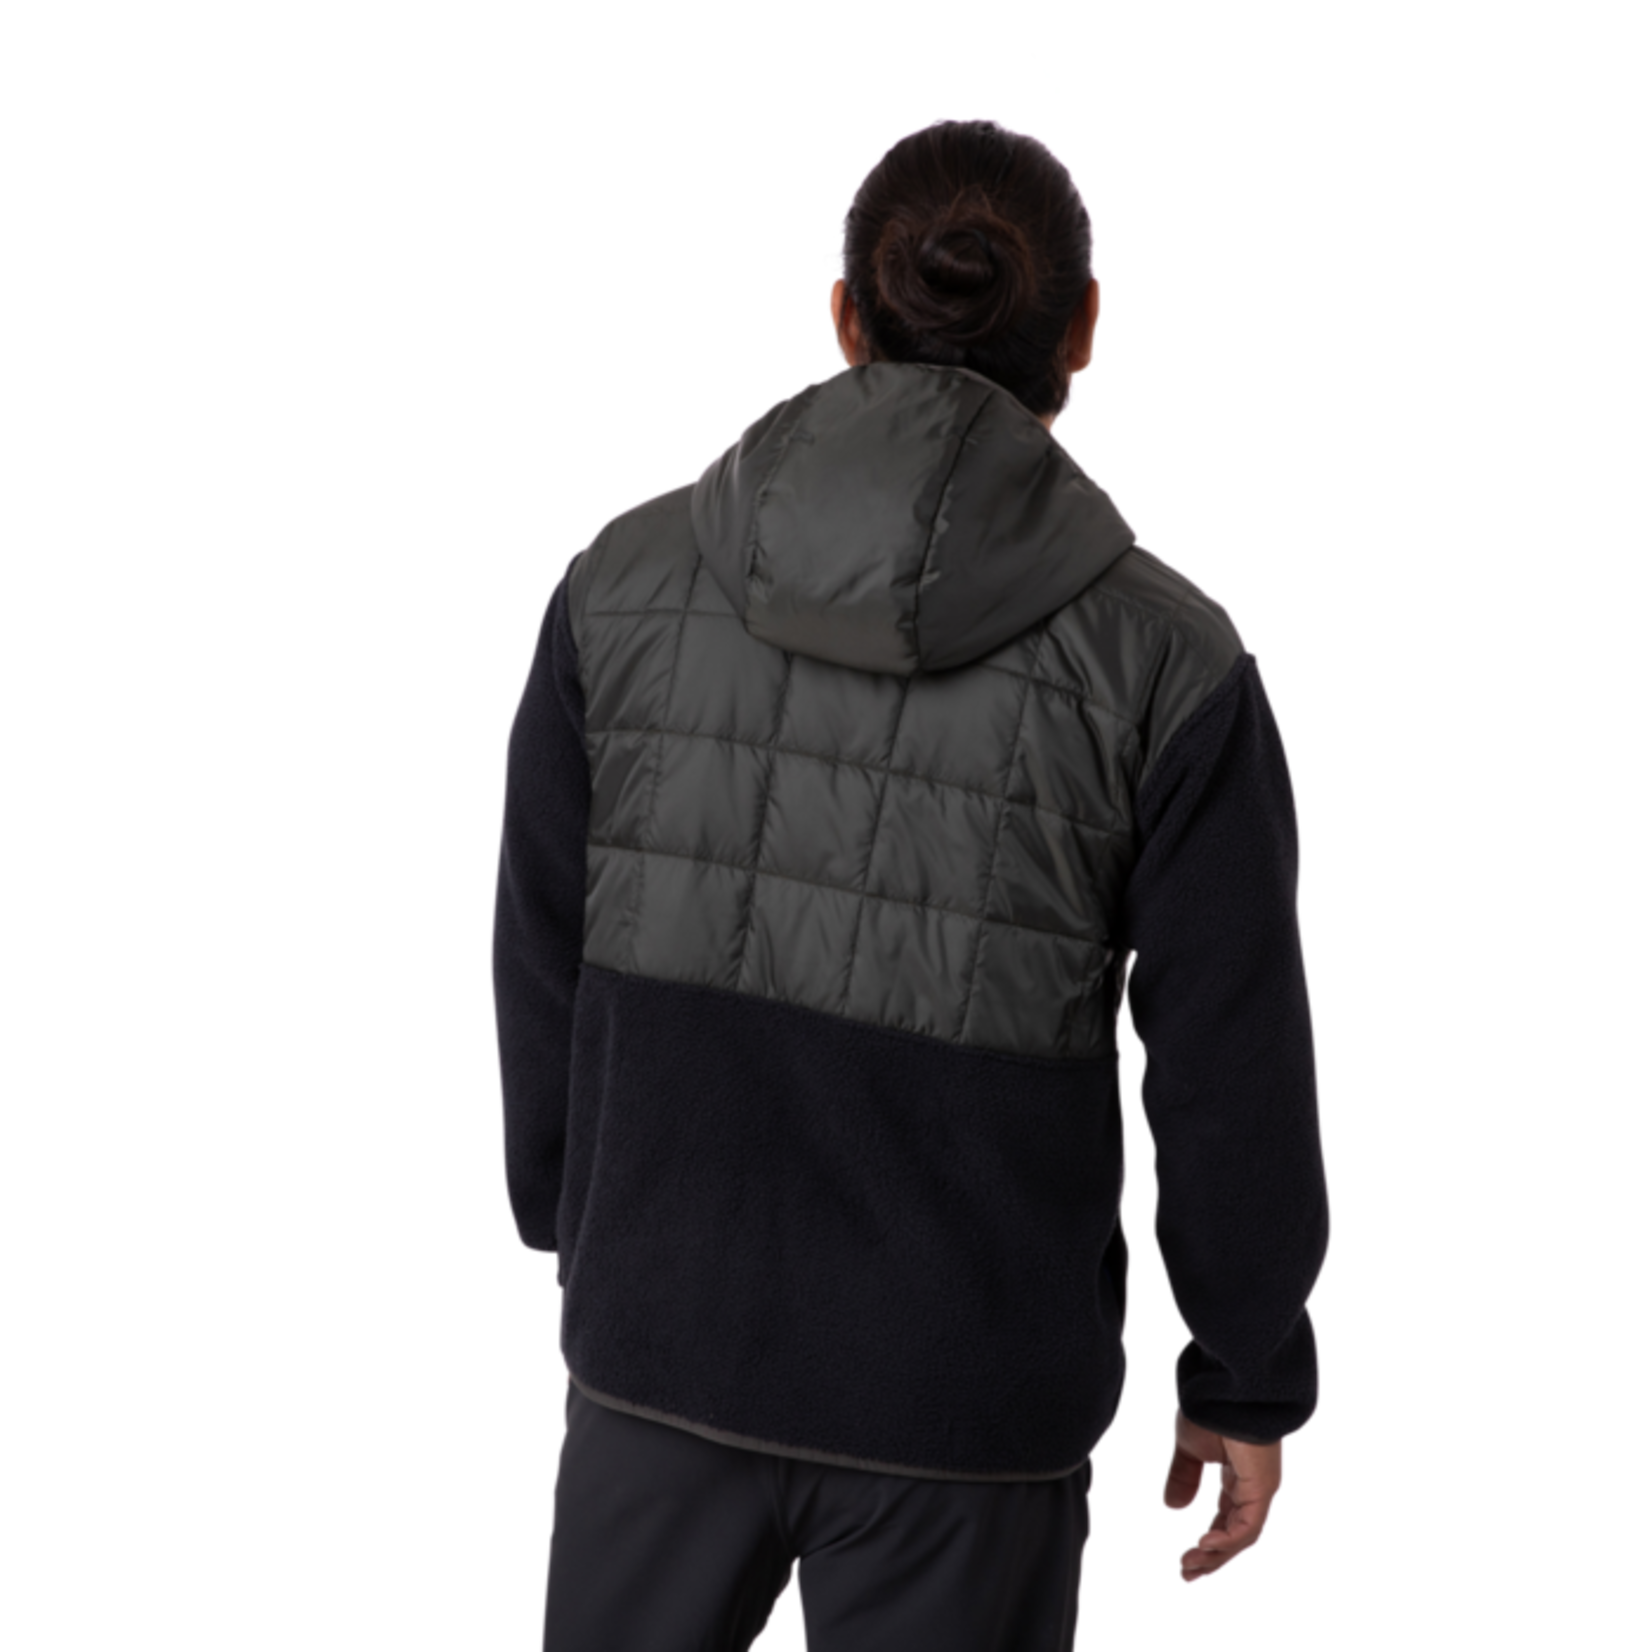 Cotopaxi Cotopaxi Trico Hybrid Jacket